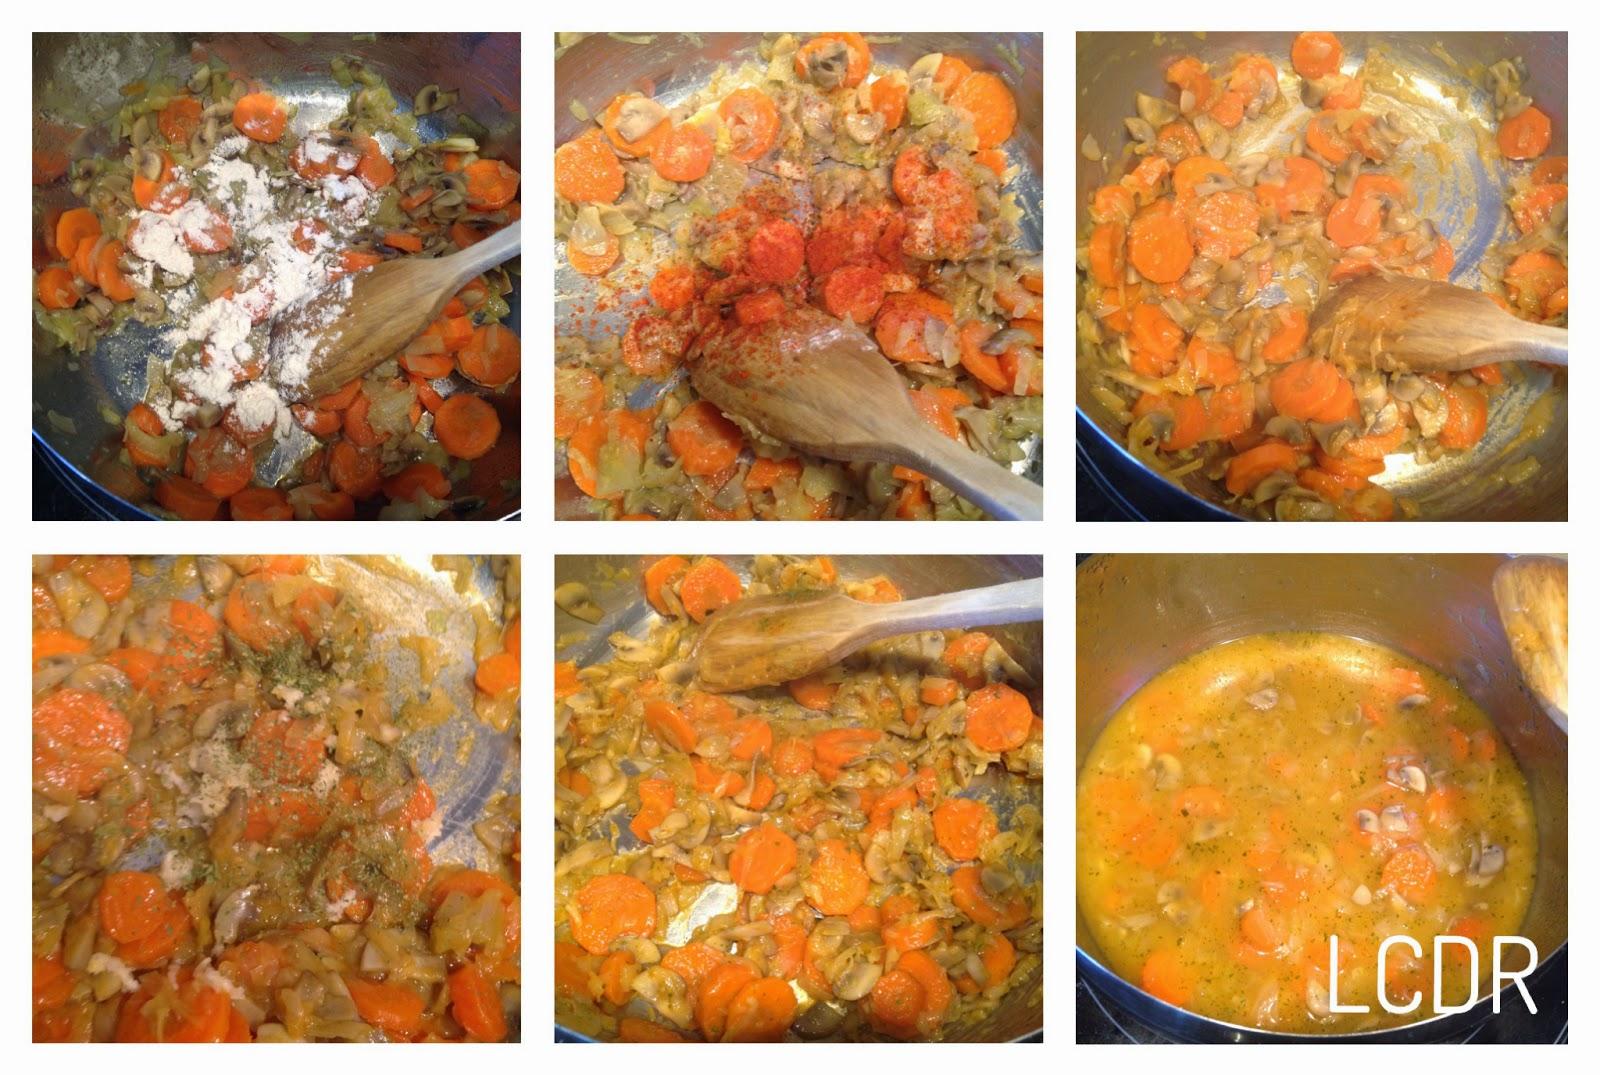 Receta de albóndigas de carne en salsa: salsa 02